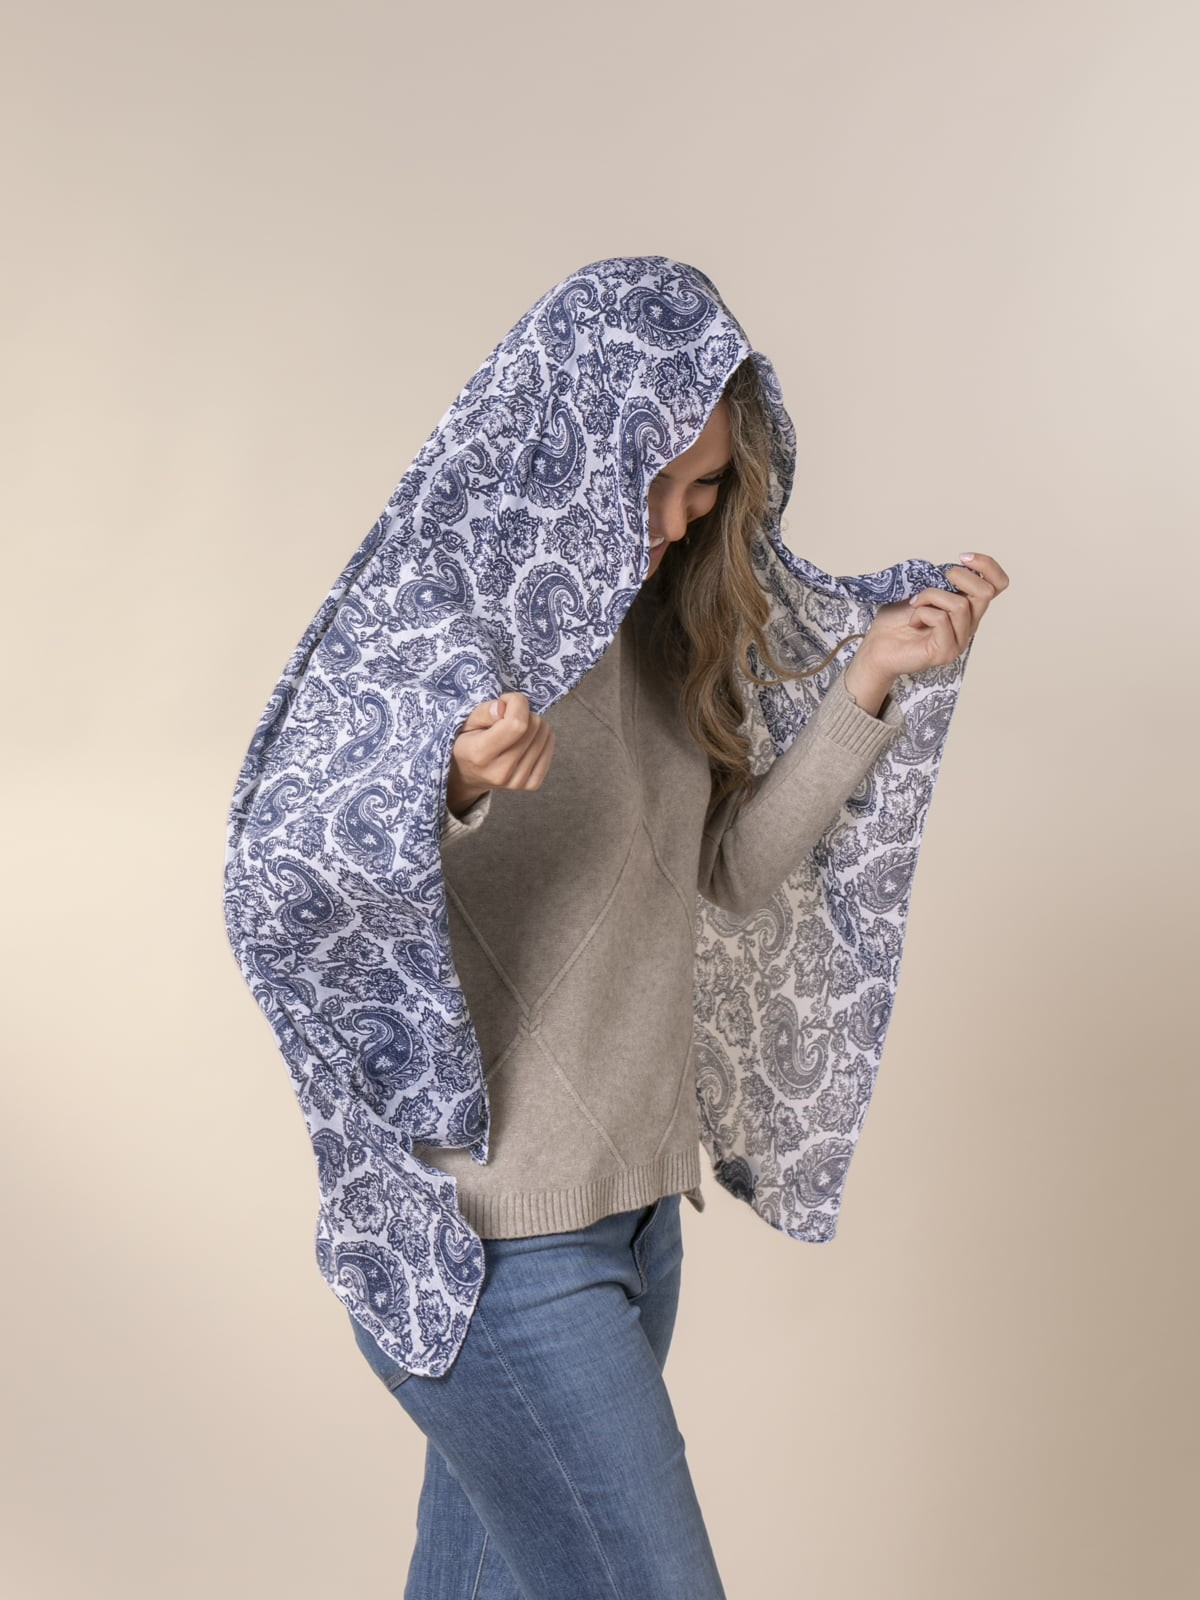 Fular mujer monocolor amebas Azul Marino